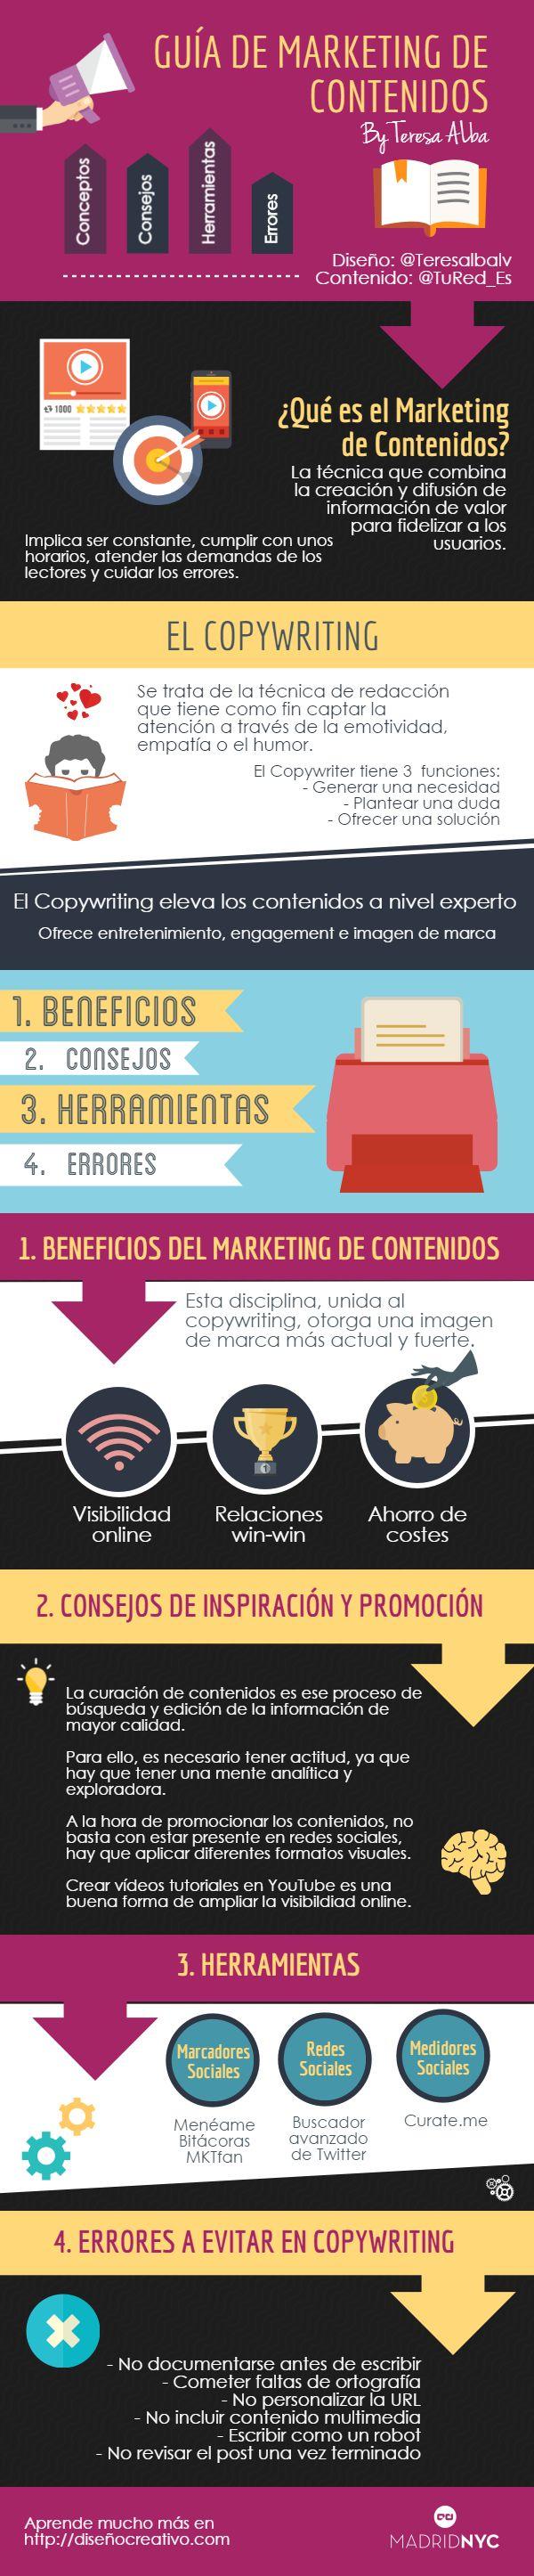 Guia-marketing-de-contenidos-infografia-Teresa-Alba-MadridNYC